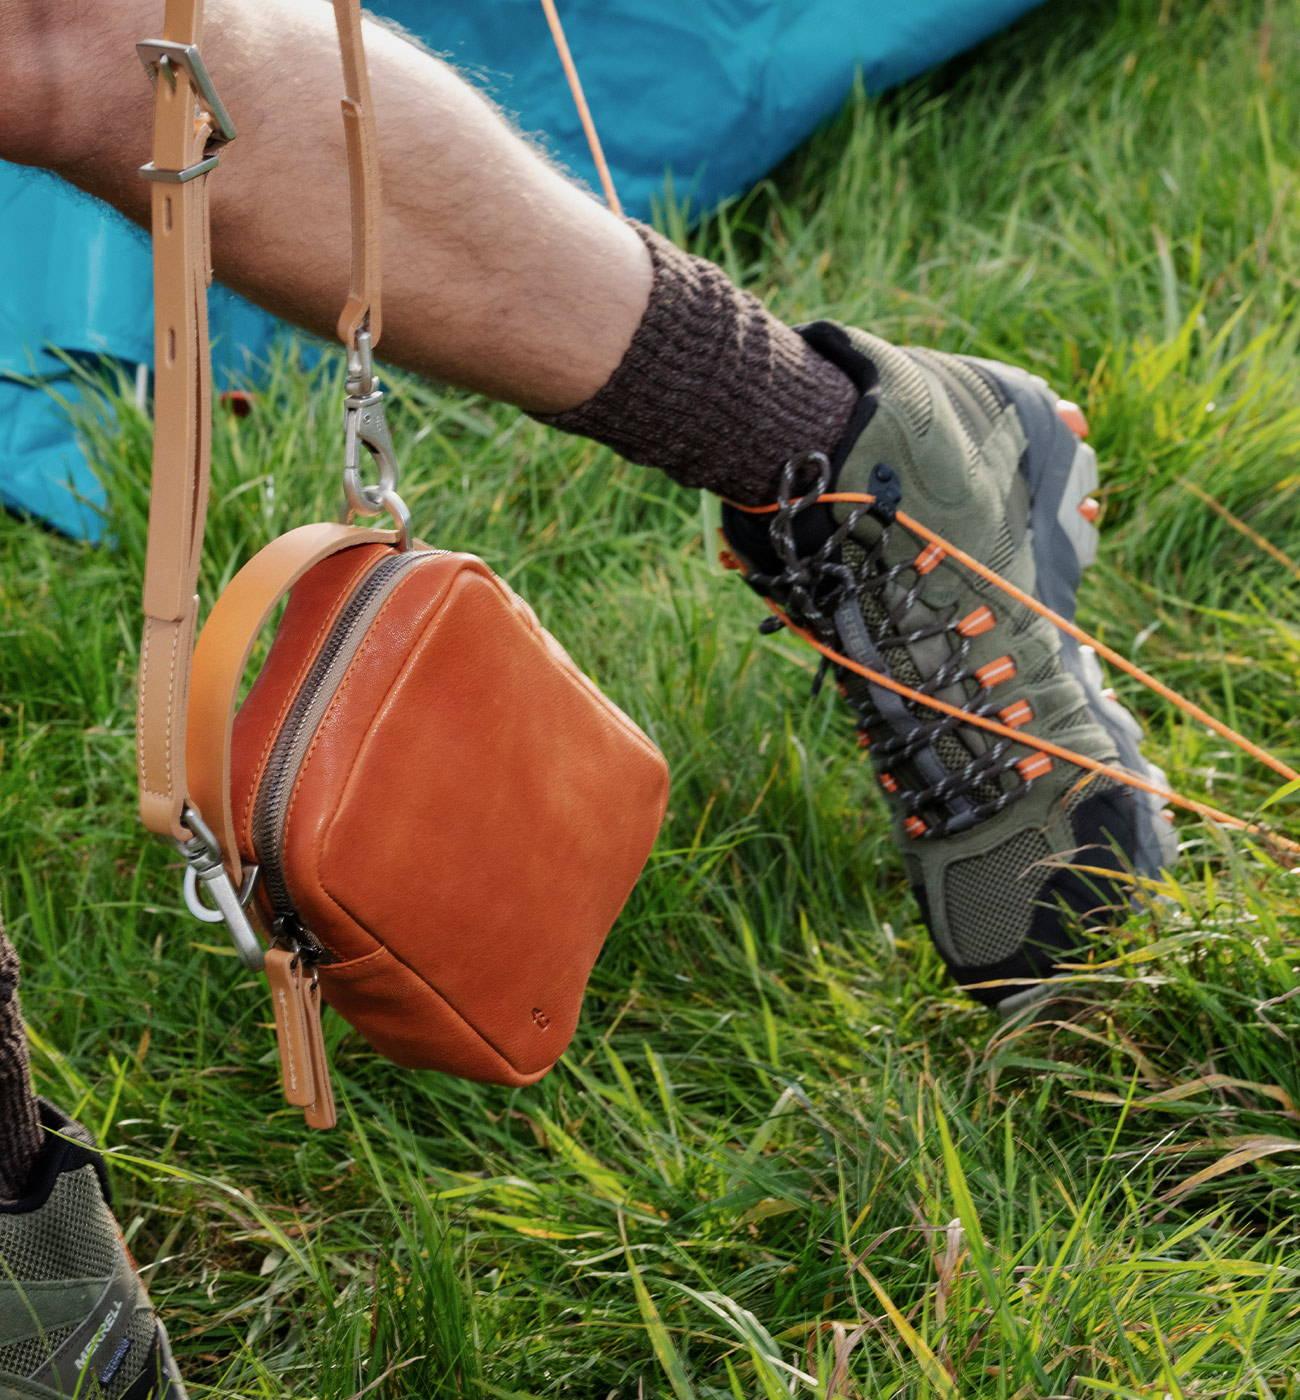 Model carrying Hurley Calvert Leather Crossbody Bag in Tan